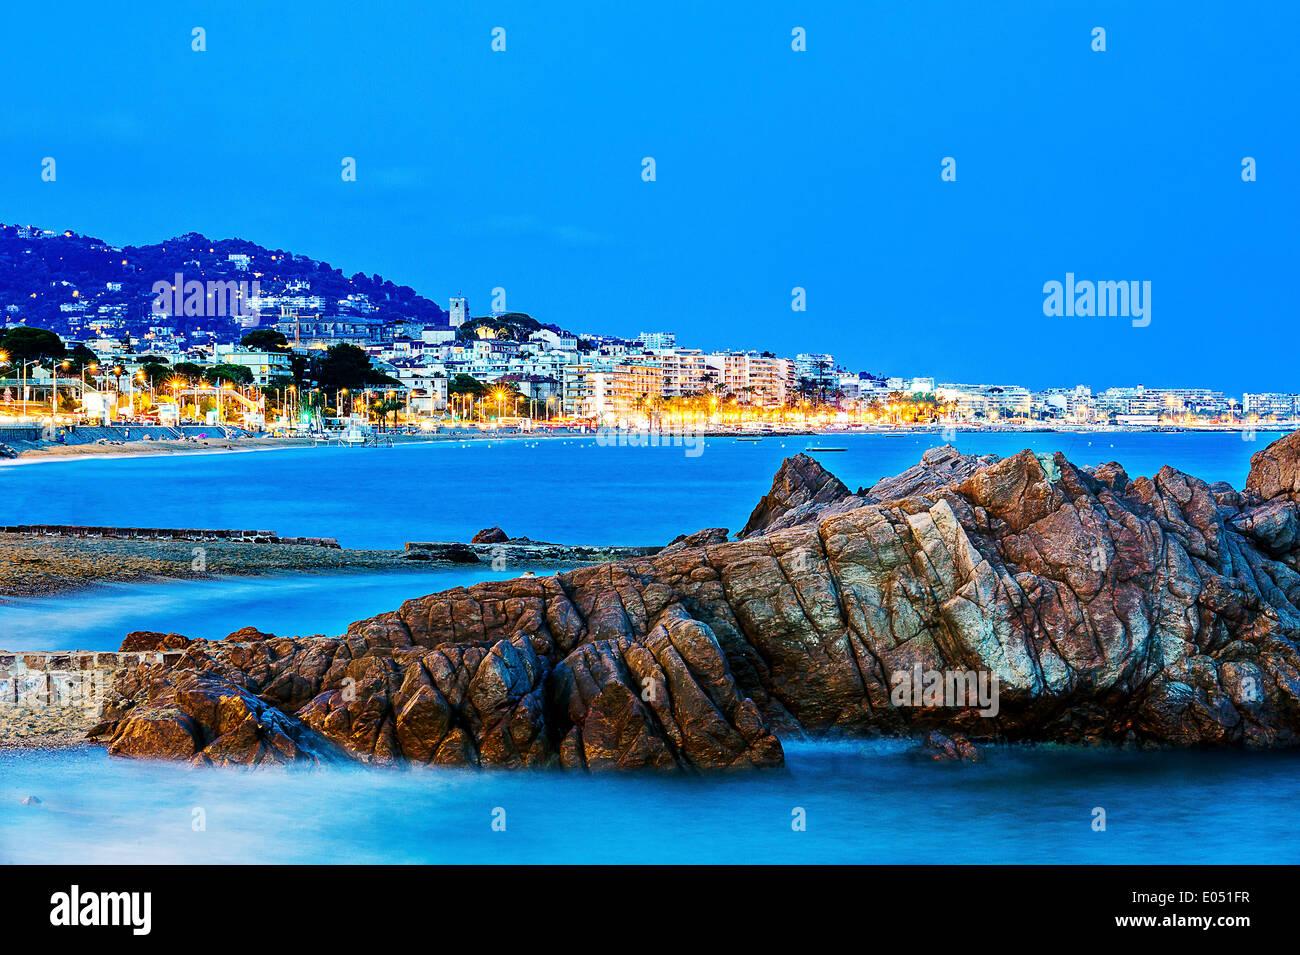 Europa, Francia, Alpes-Maritimes, Cannes. Bahía de Cannes al anochecer. Imagen De Stock